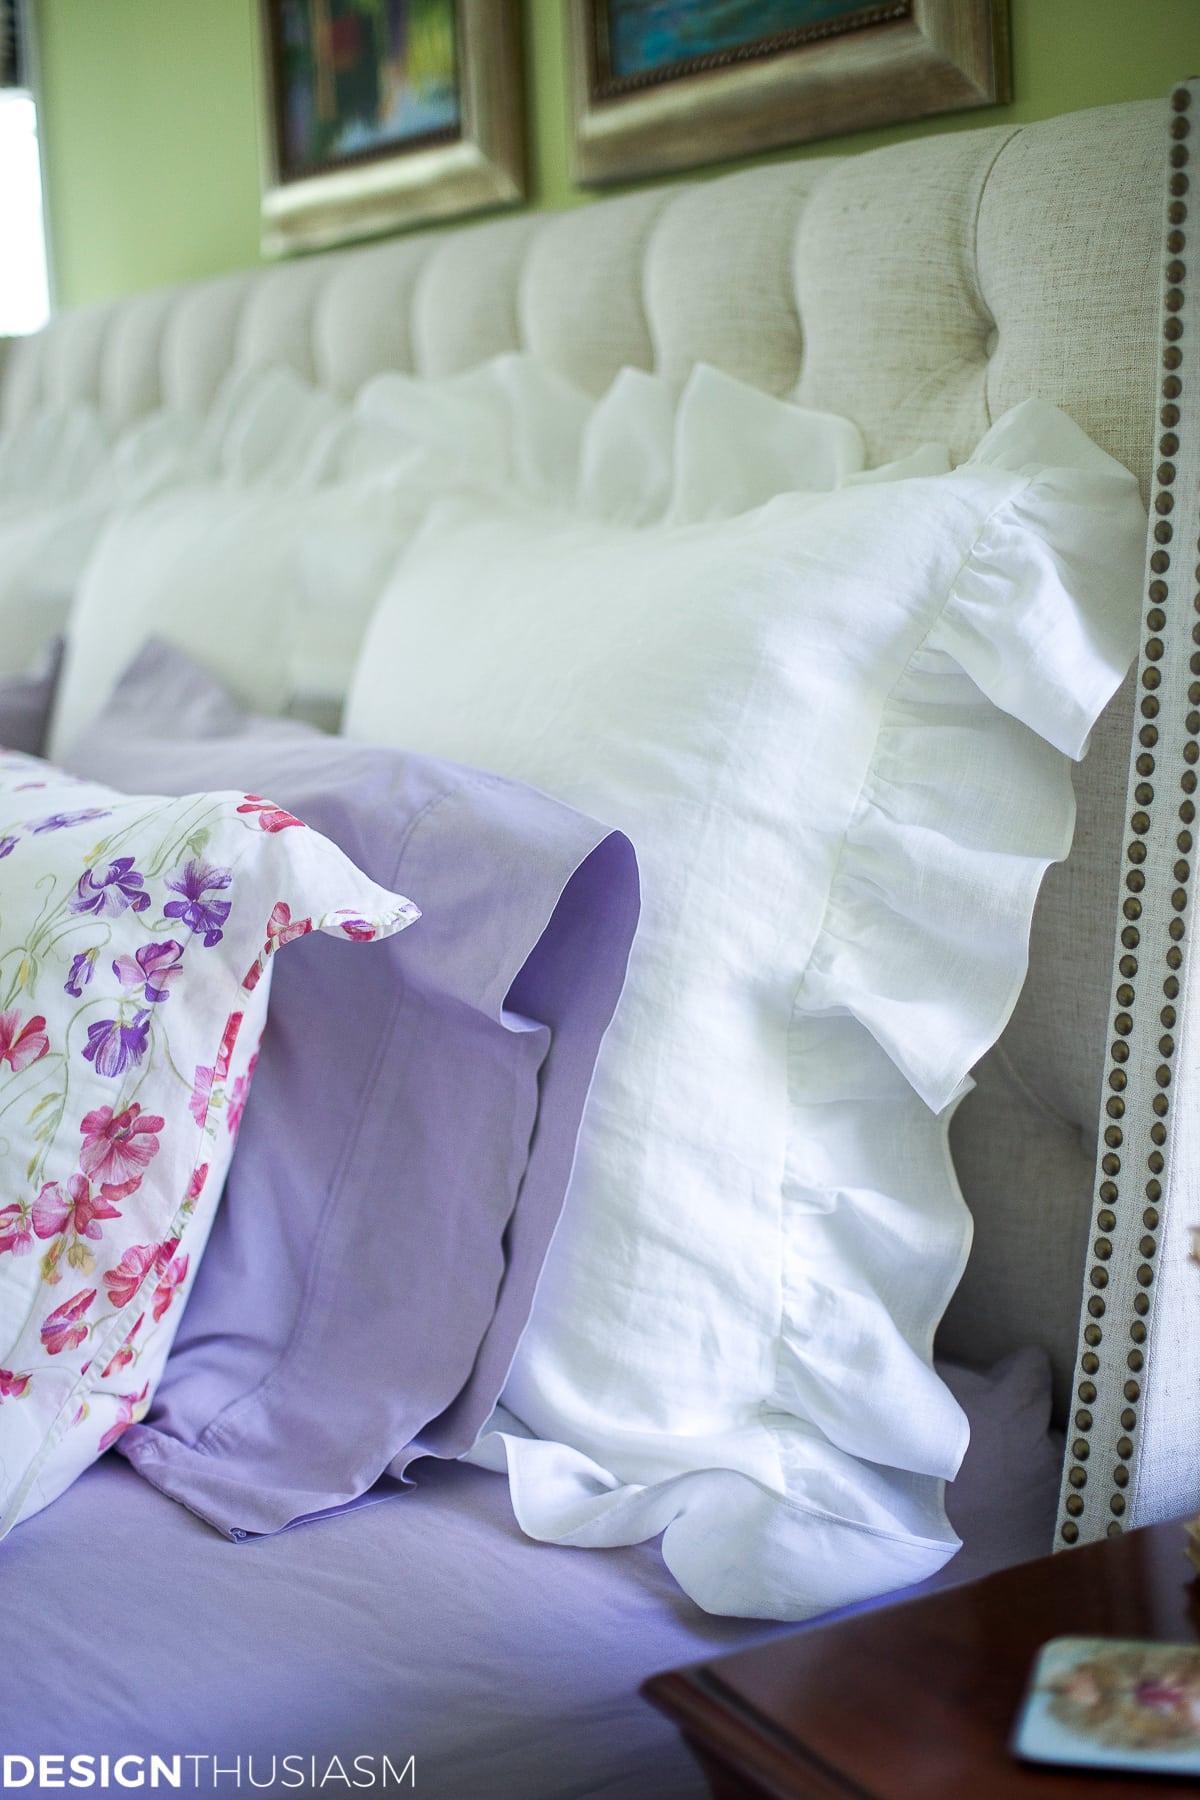 White linen pillow shams update the master bedroom - designthusiasm.com